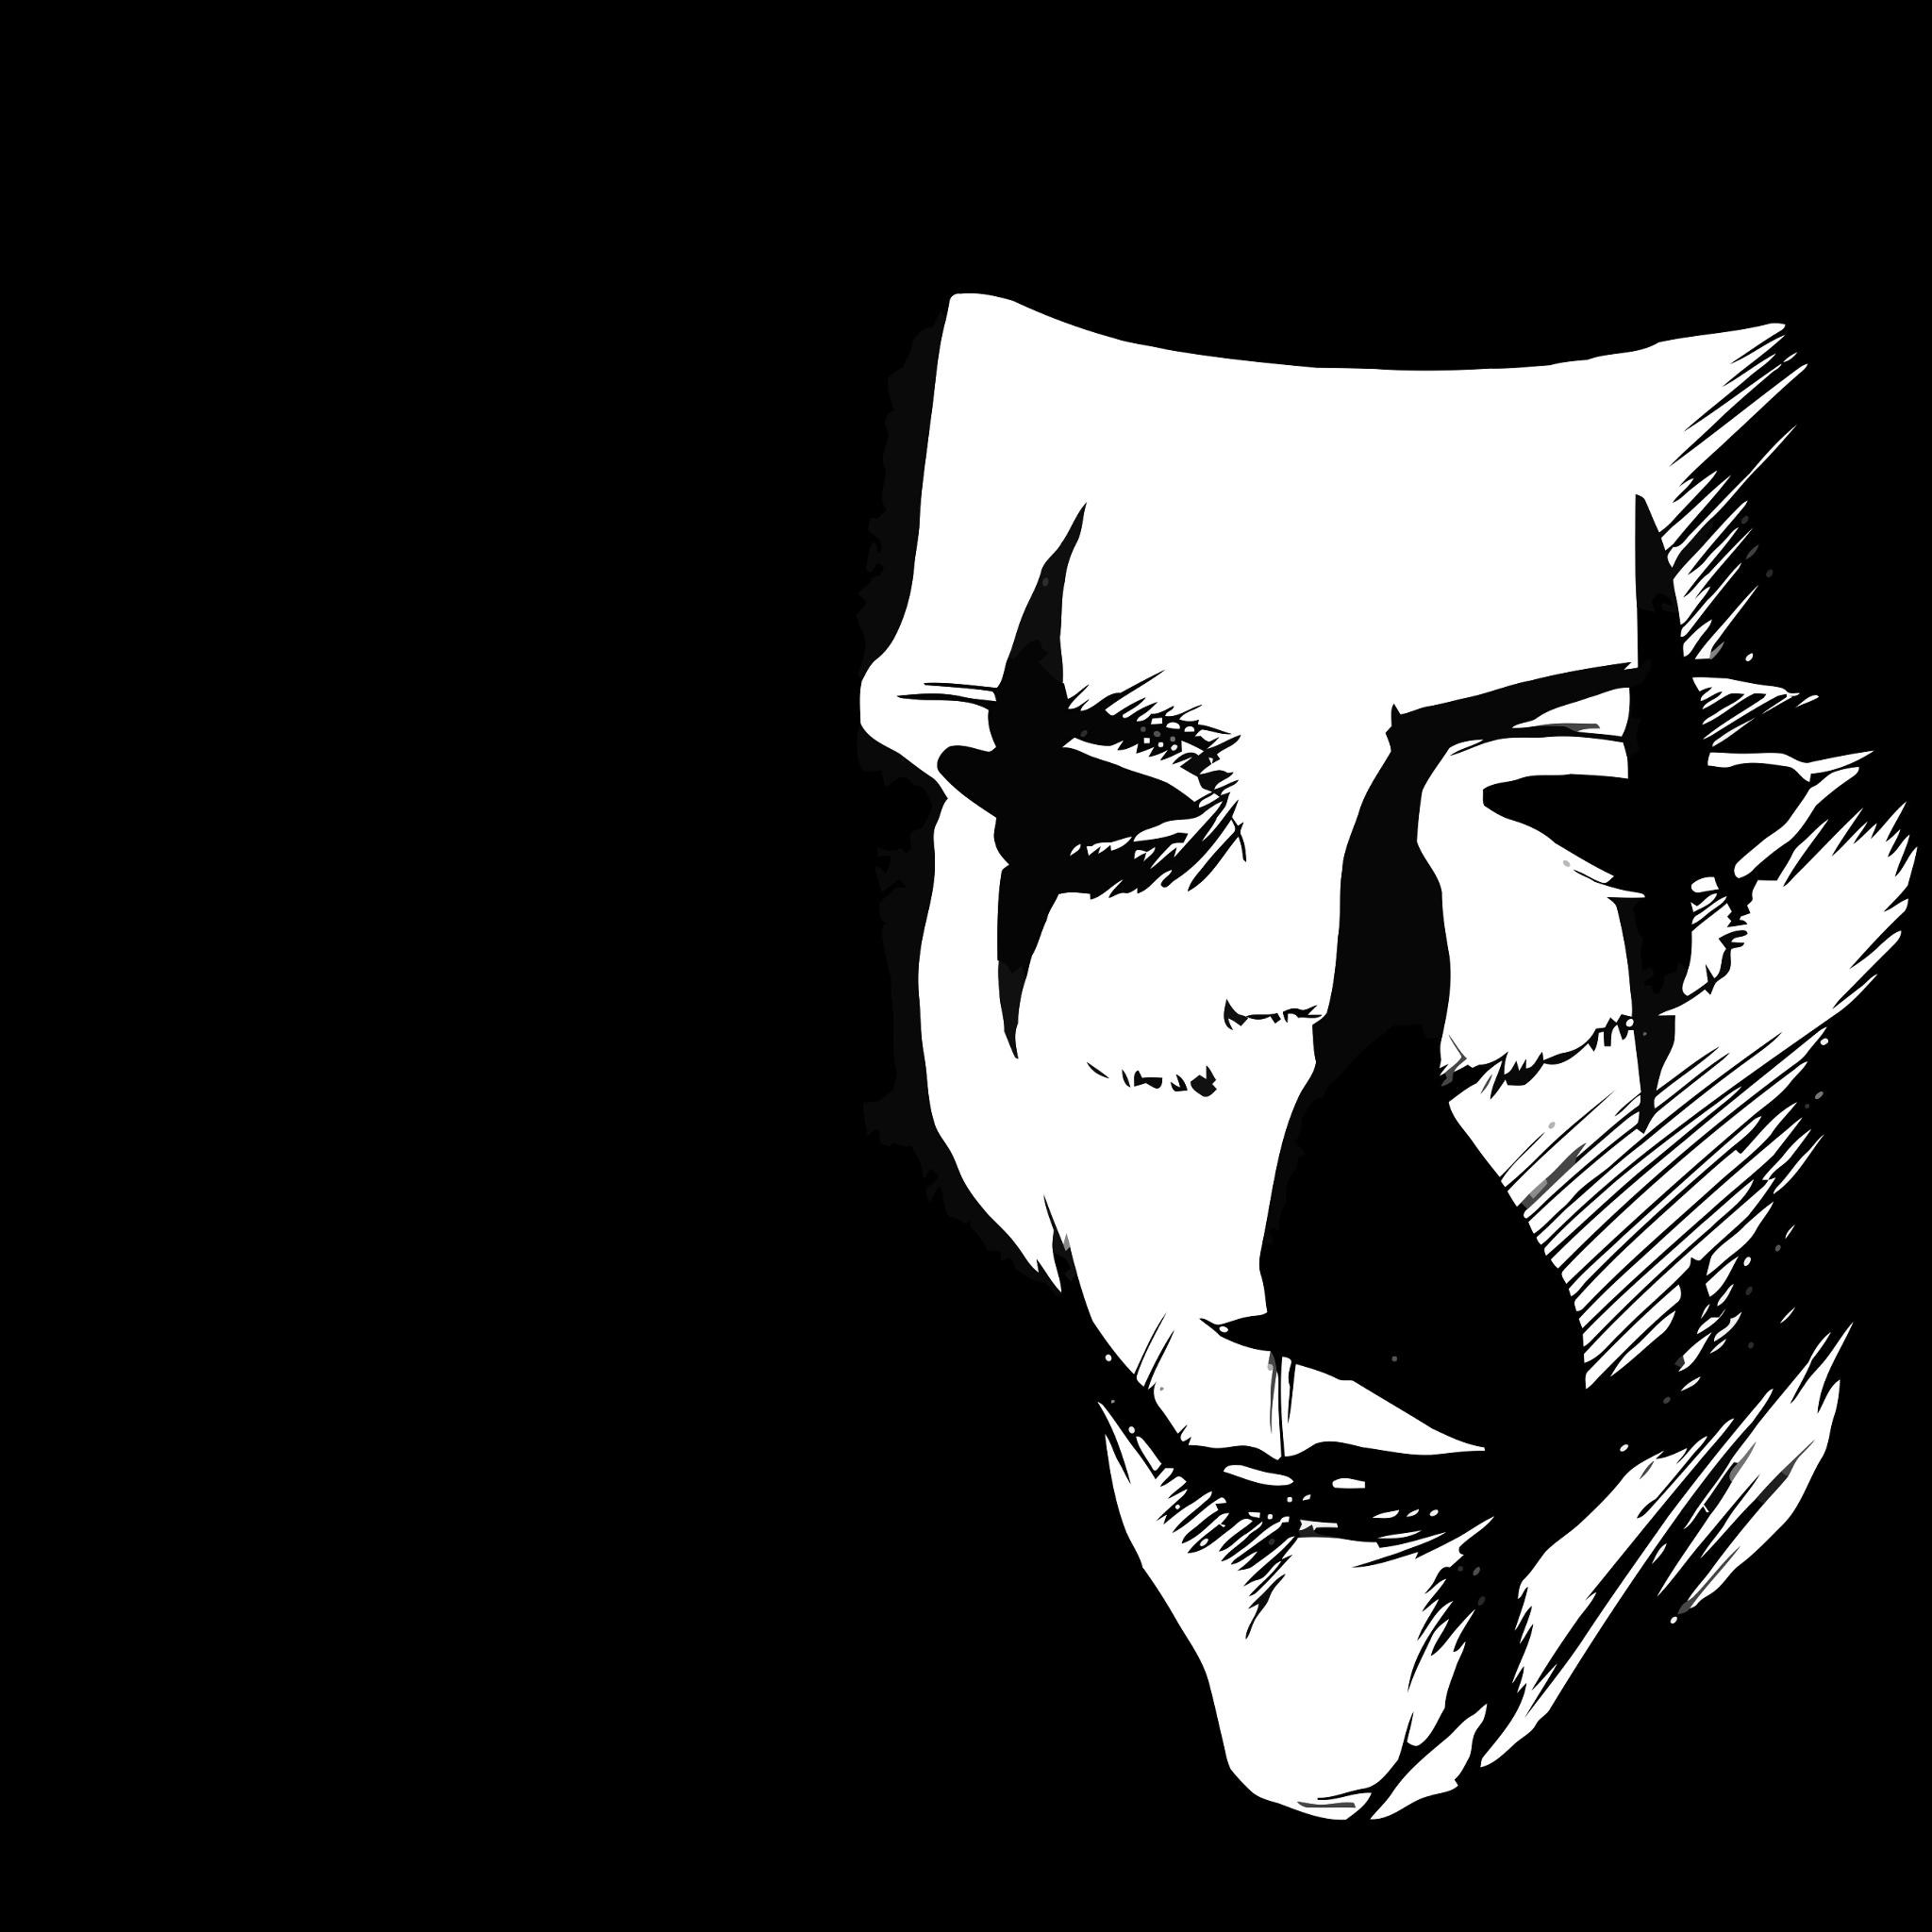 Joker Iphone X Wallpaper 45446 The Joker Taking Off His Mask The